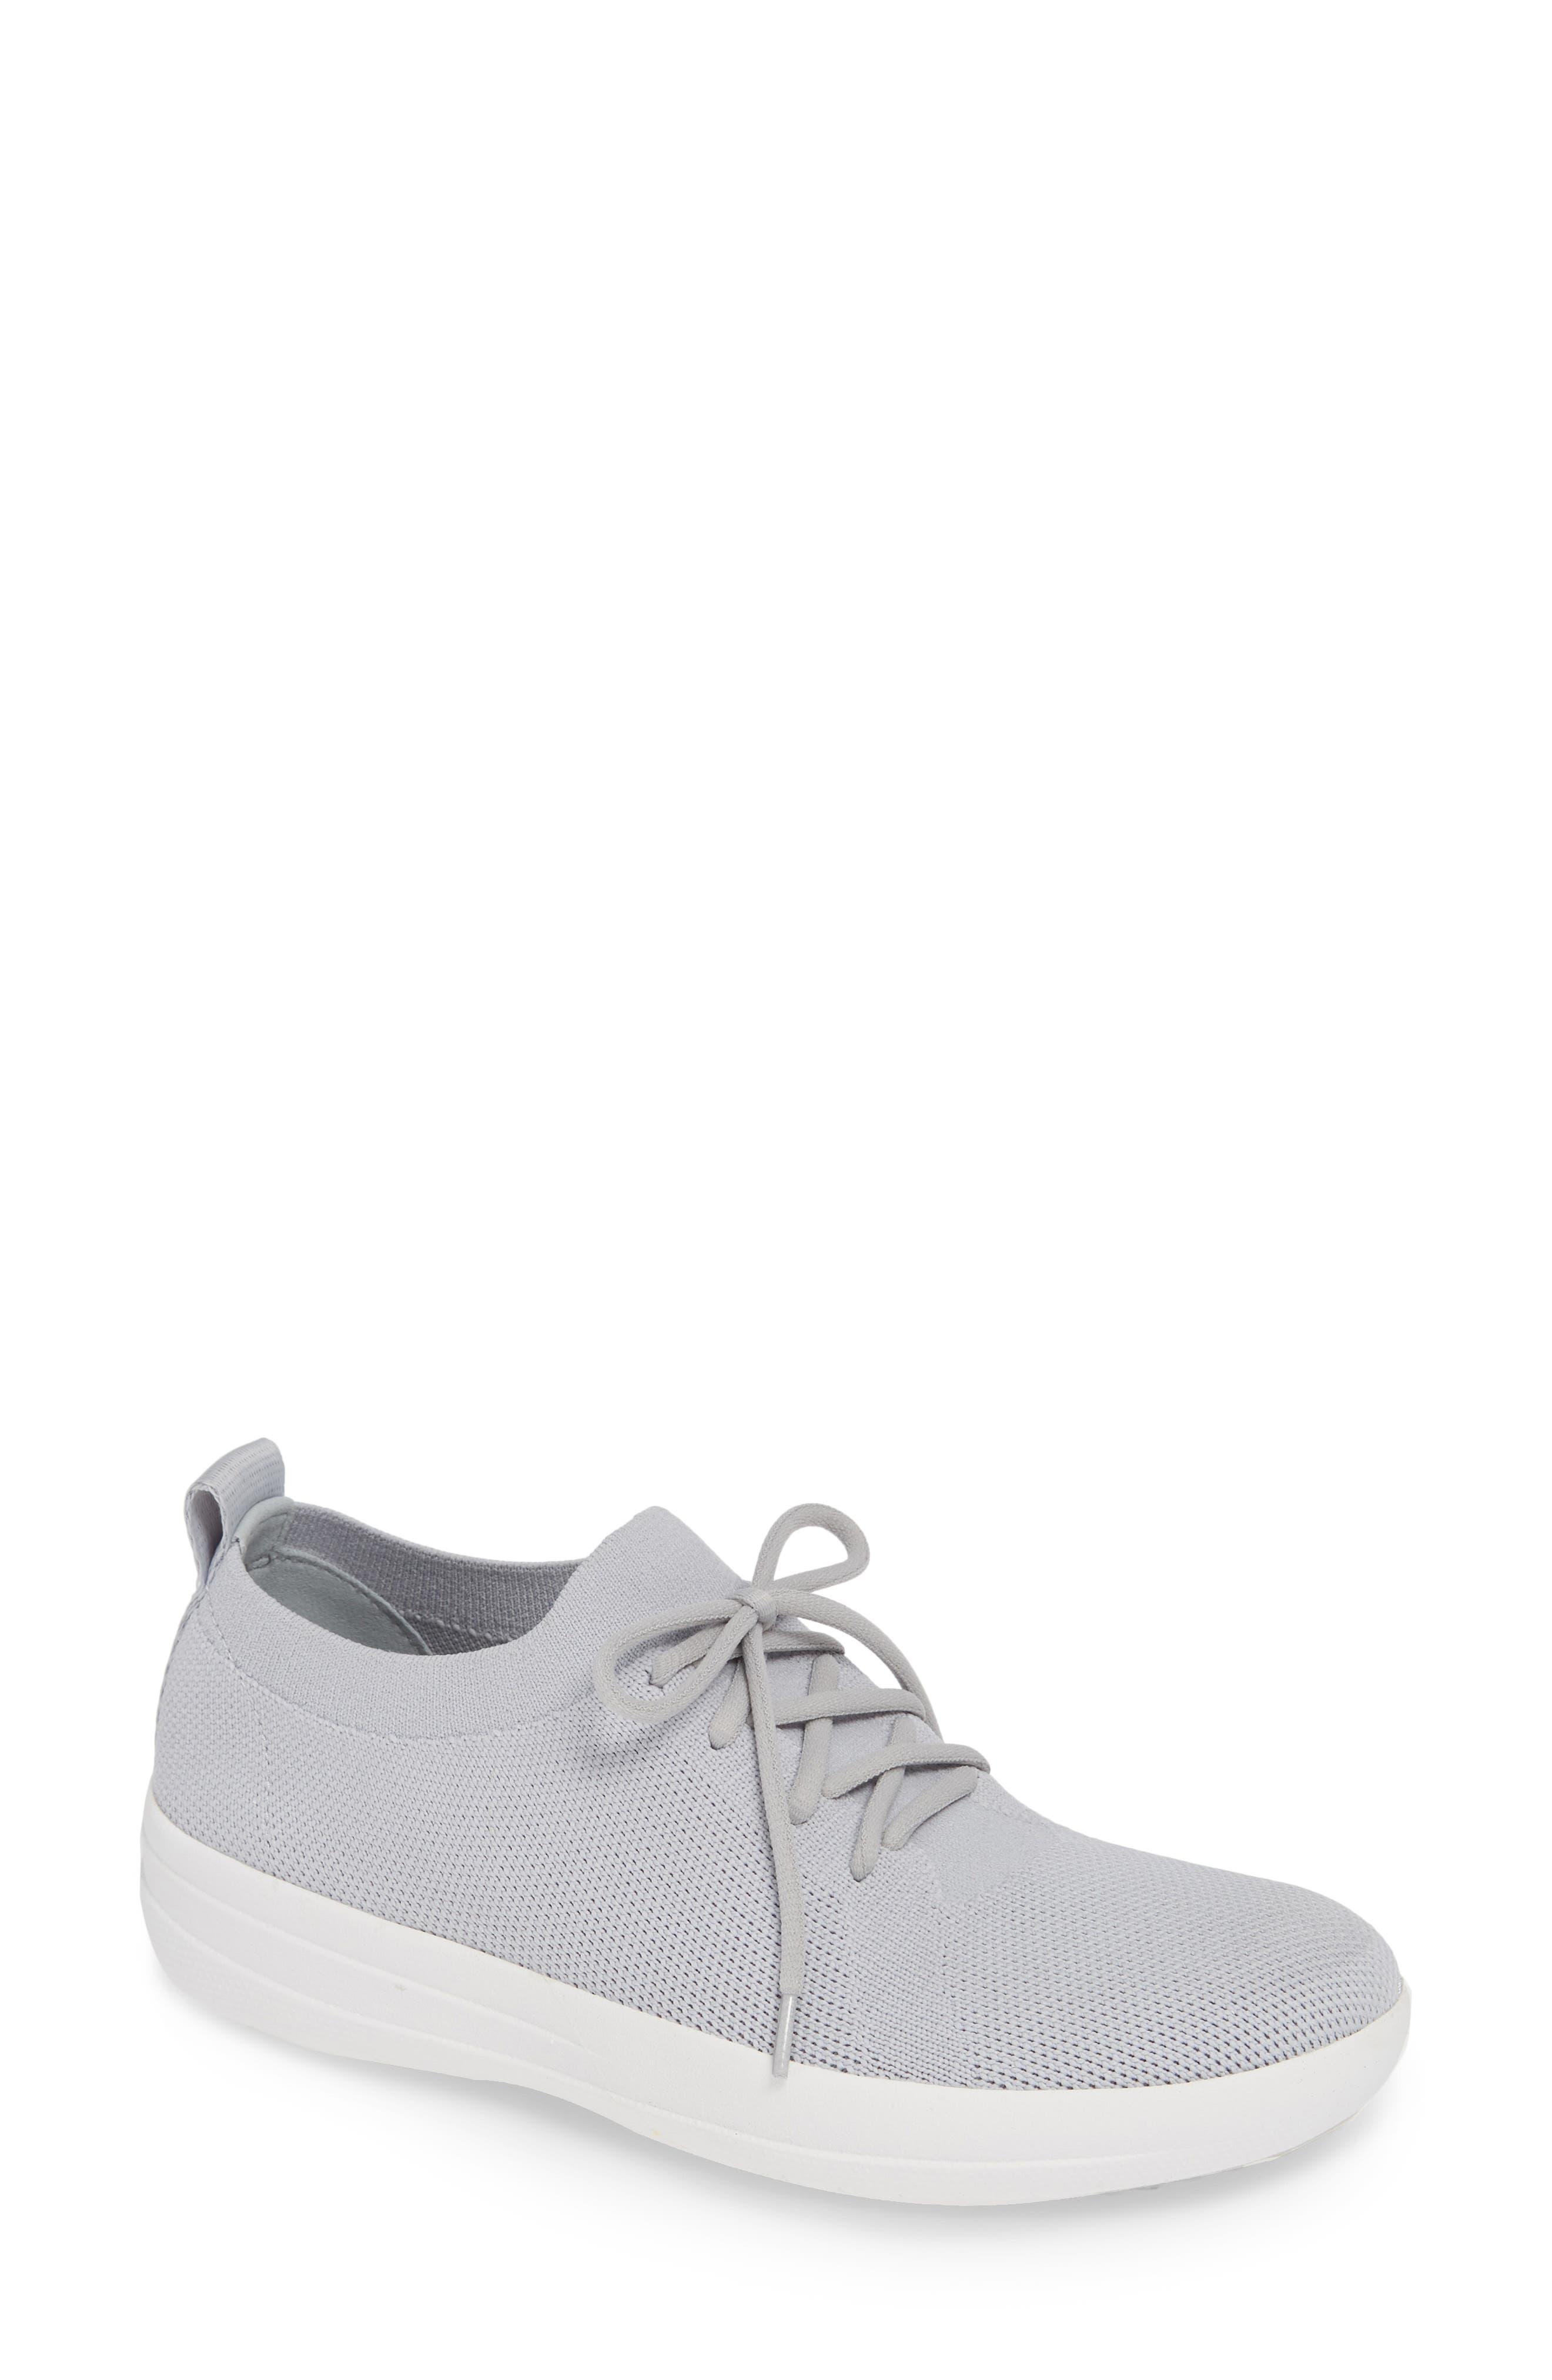 F-Sporty Uberknit<sup>™</sup> Sneaker,                             Main thumbnail 1, color,                             PEARL FABRIC